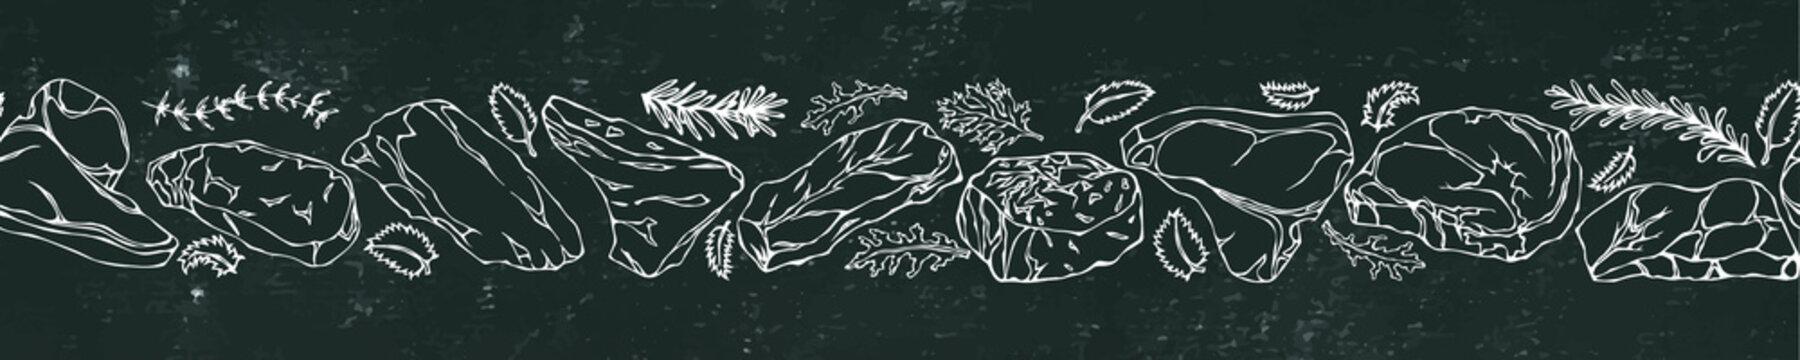 Black Board Background and Chalk. Ribbon of of Popular Steak Types.Steak House Restaurant Menu. Hand Drawn Illustration. Savoyar Doodle Style. Porterhouse, T-bone, New York Strip, Rib Eye.